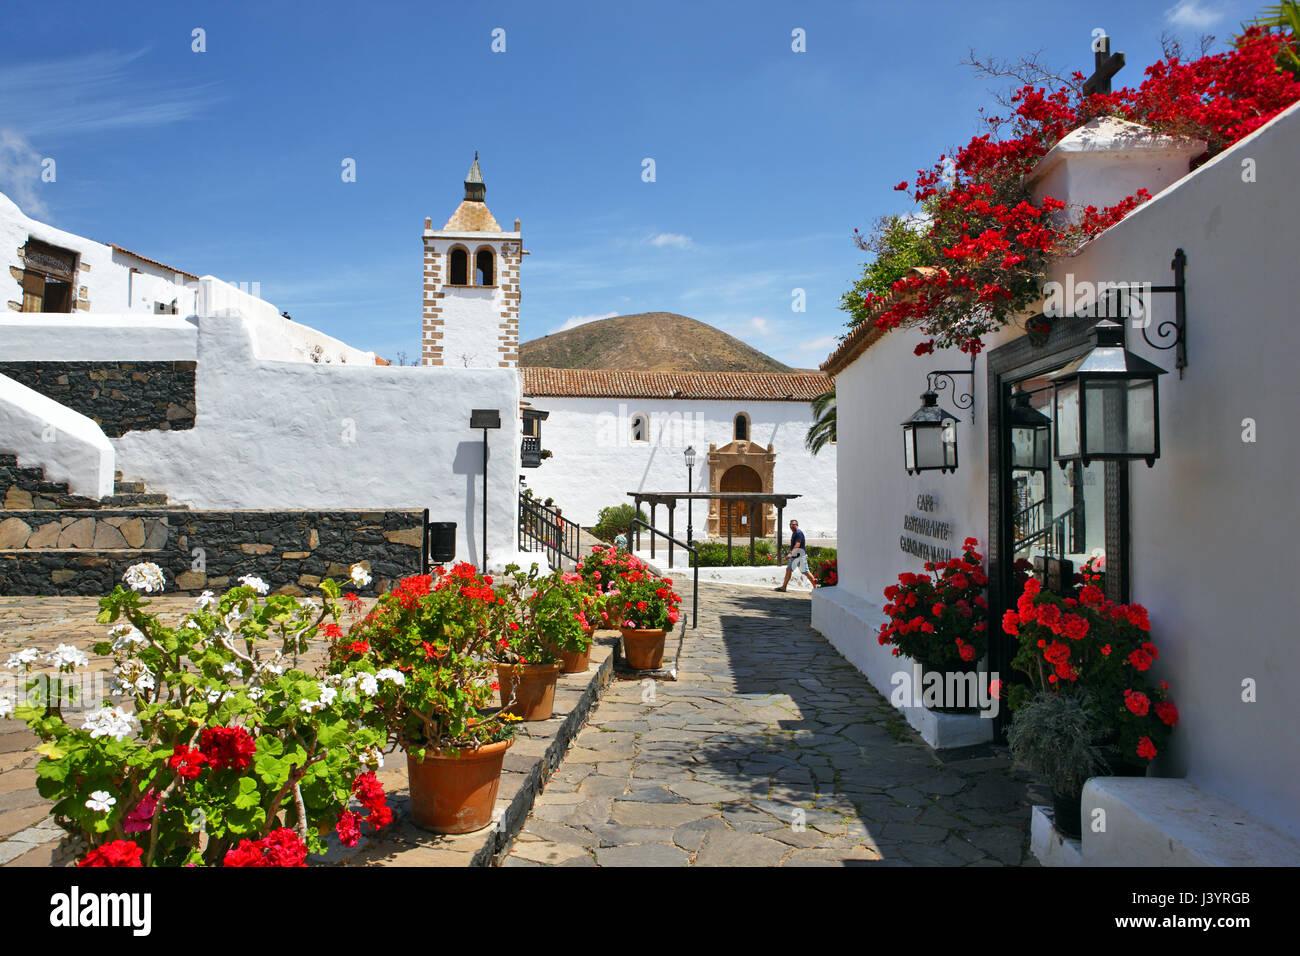 betancuria-fuerteventura-the-pretty-whit